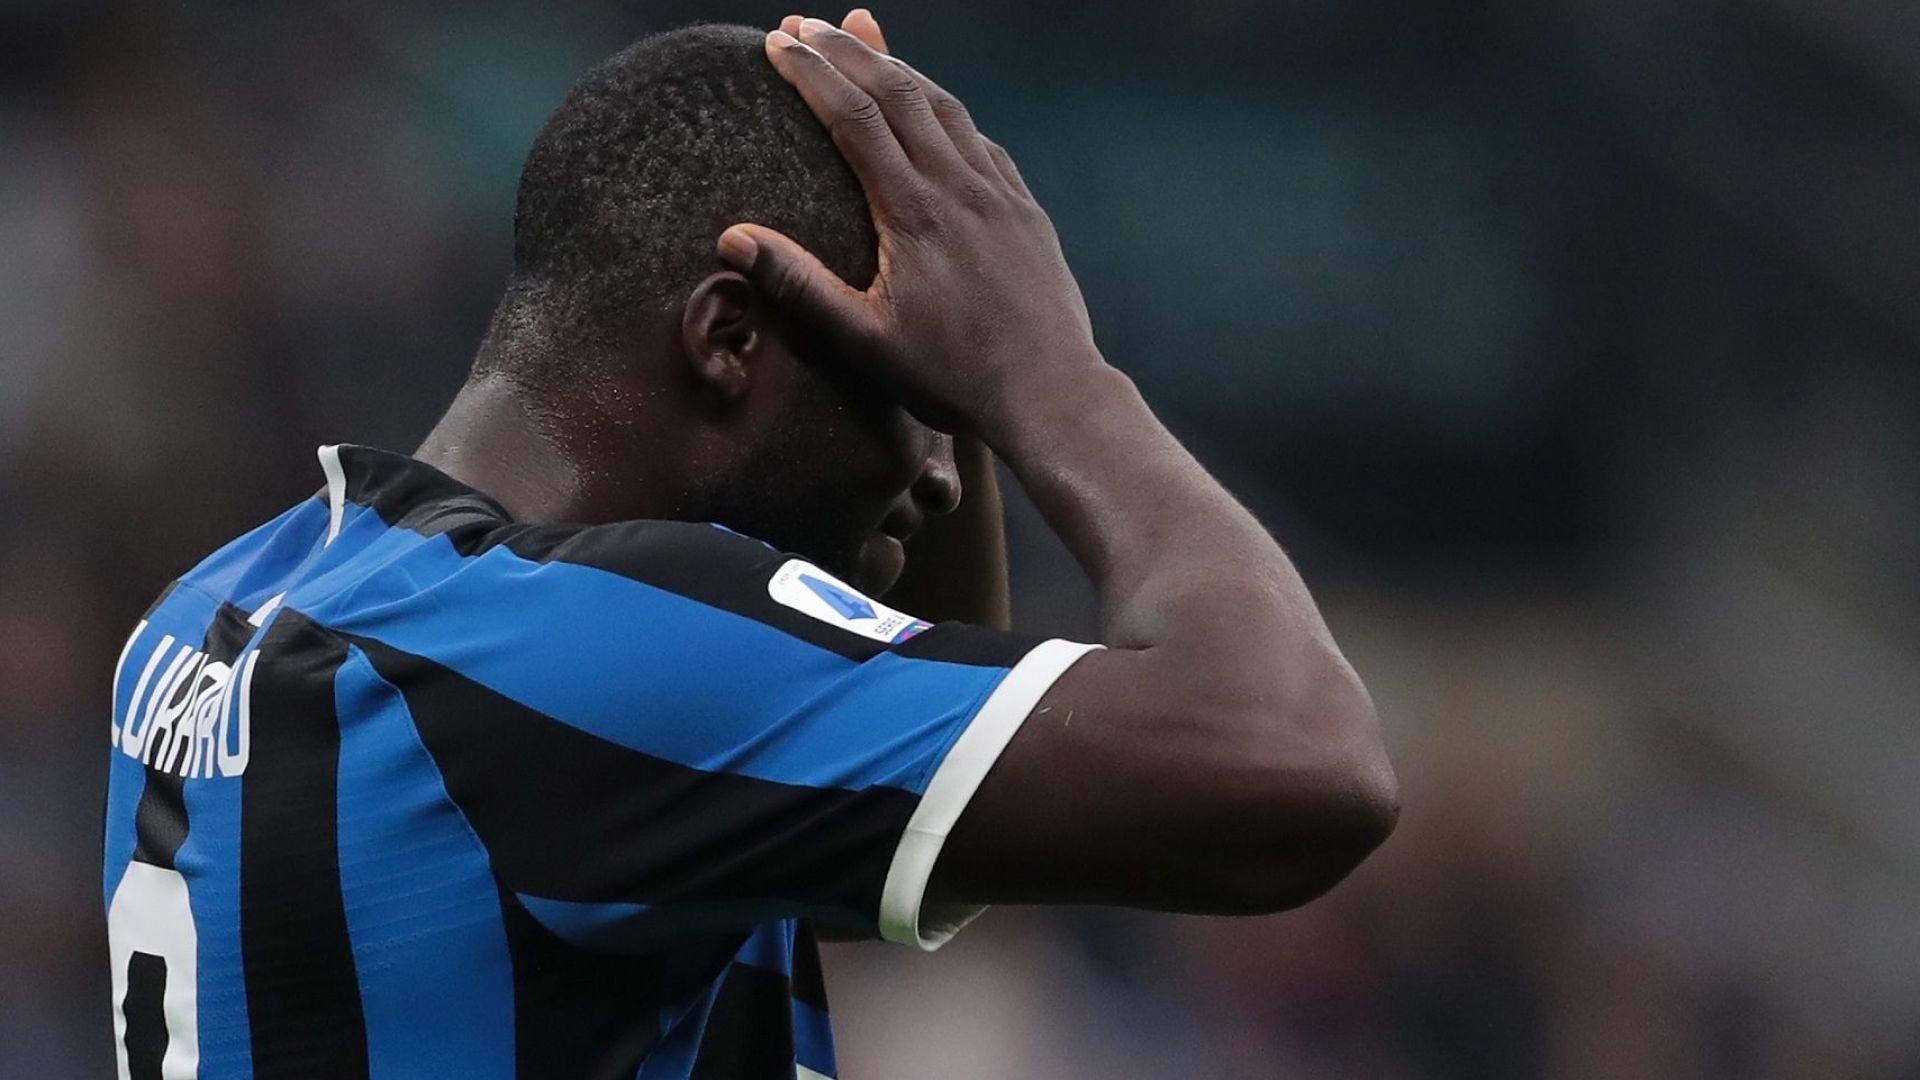 Интер се провали и отново остана зад шампиона